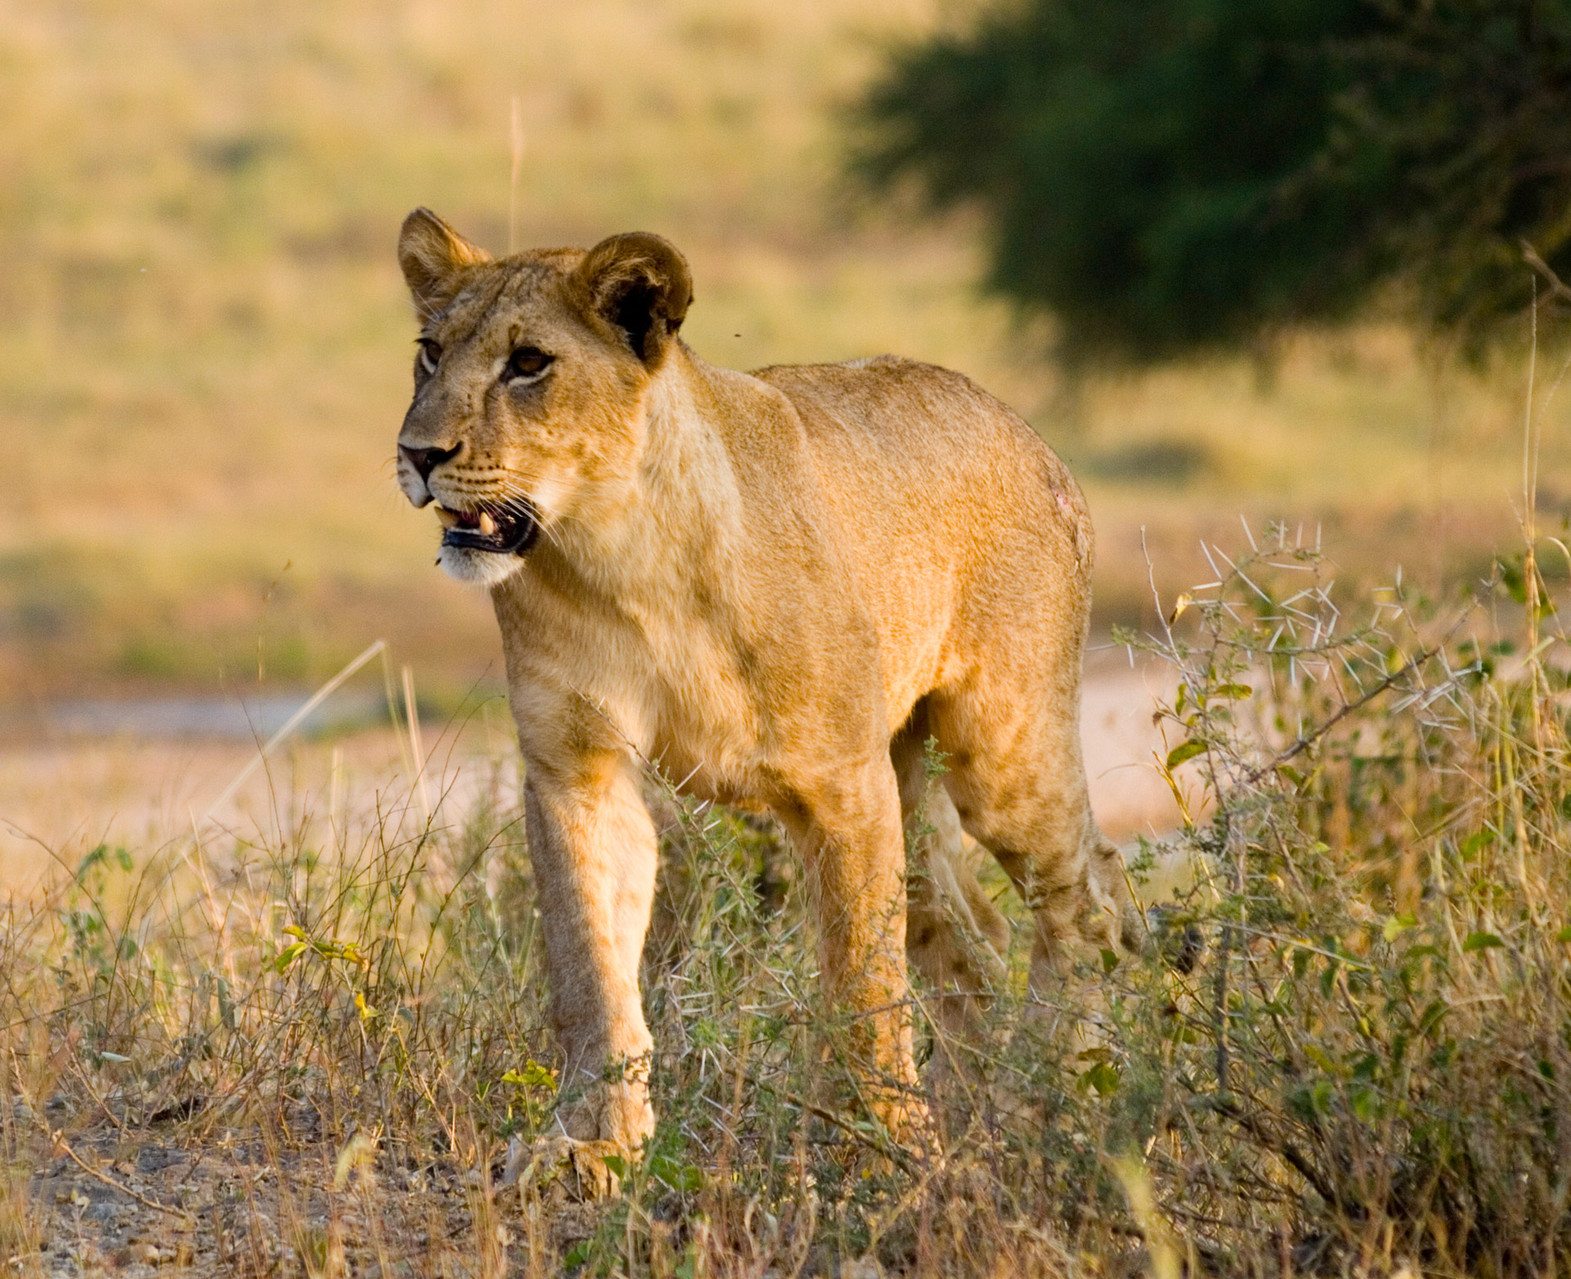 Lion [Serengeti, Tanzania, 2012]